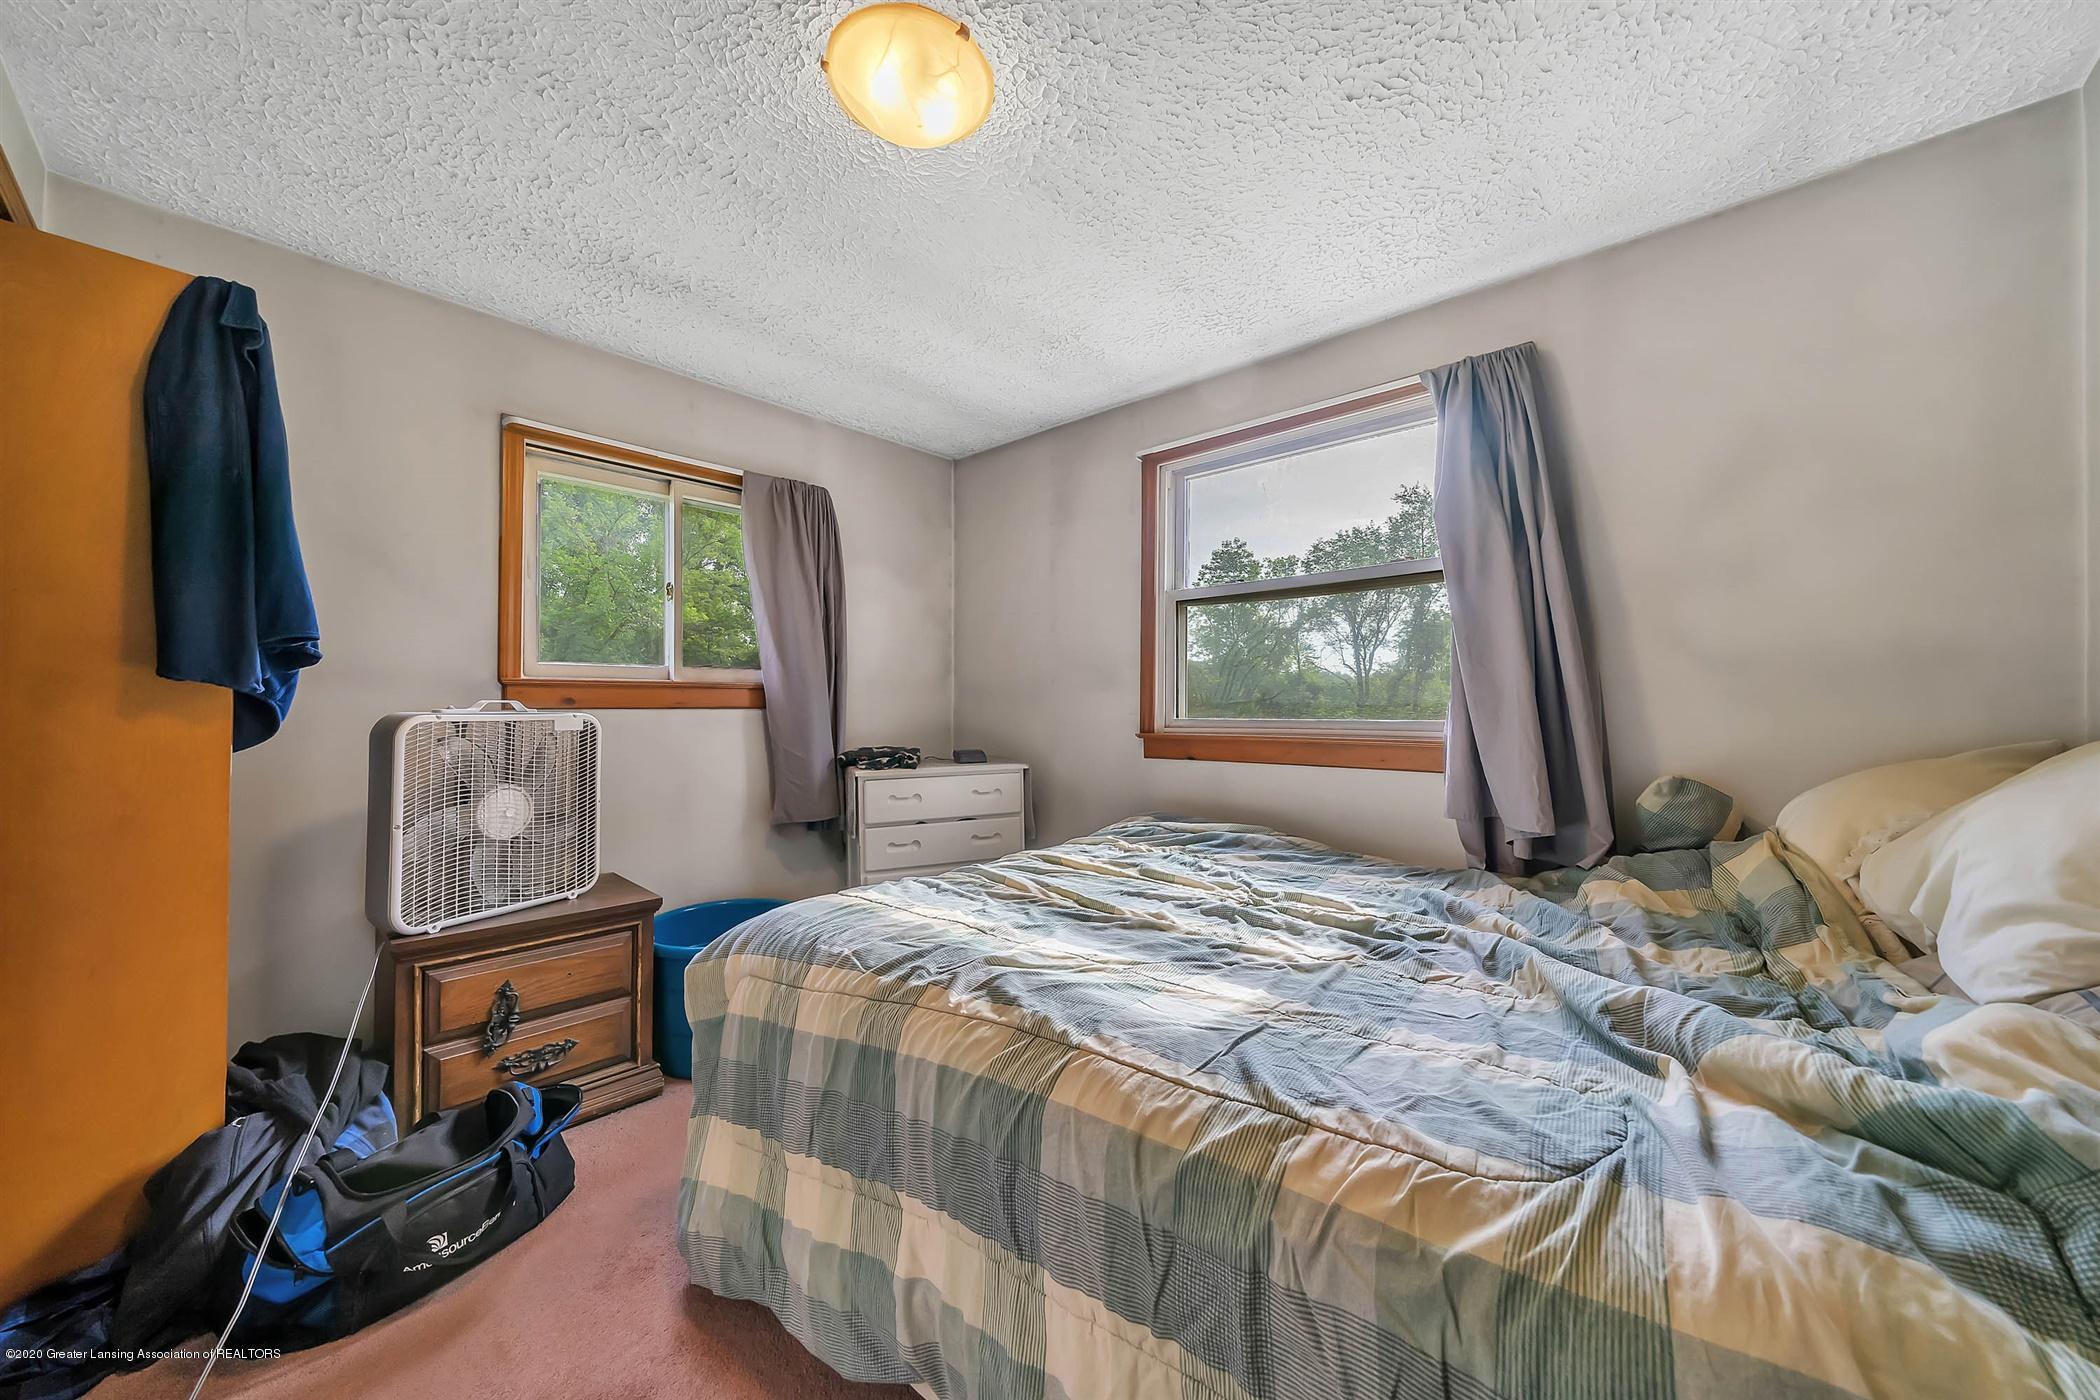 6750 W Lovejoy Rd - (38) 6758 Lovejoy Bedroom 1 - 38